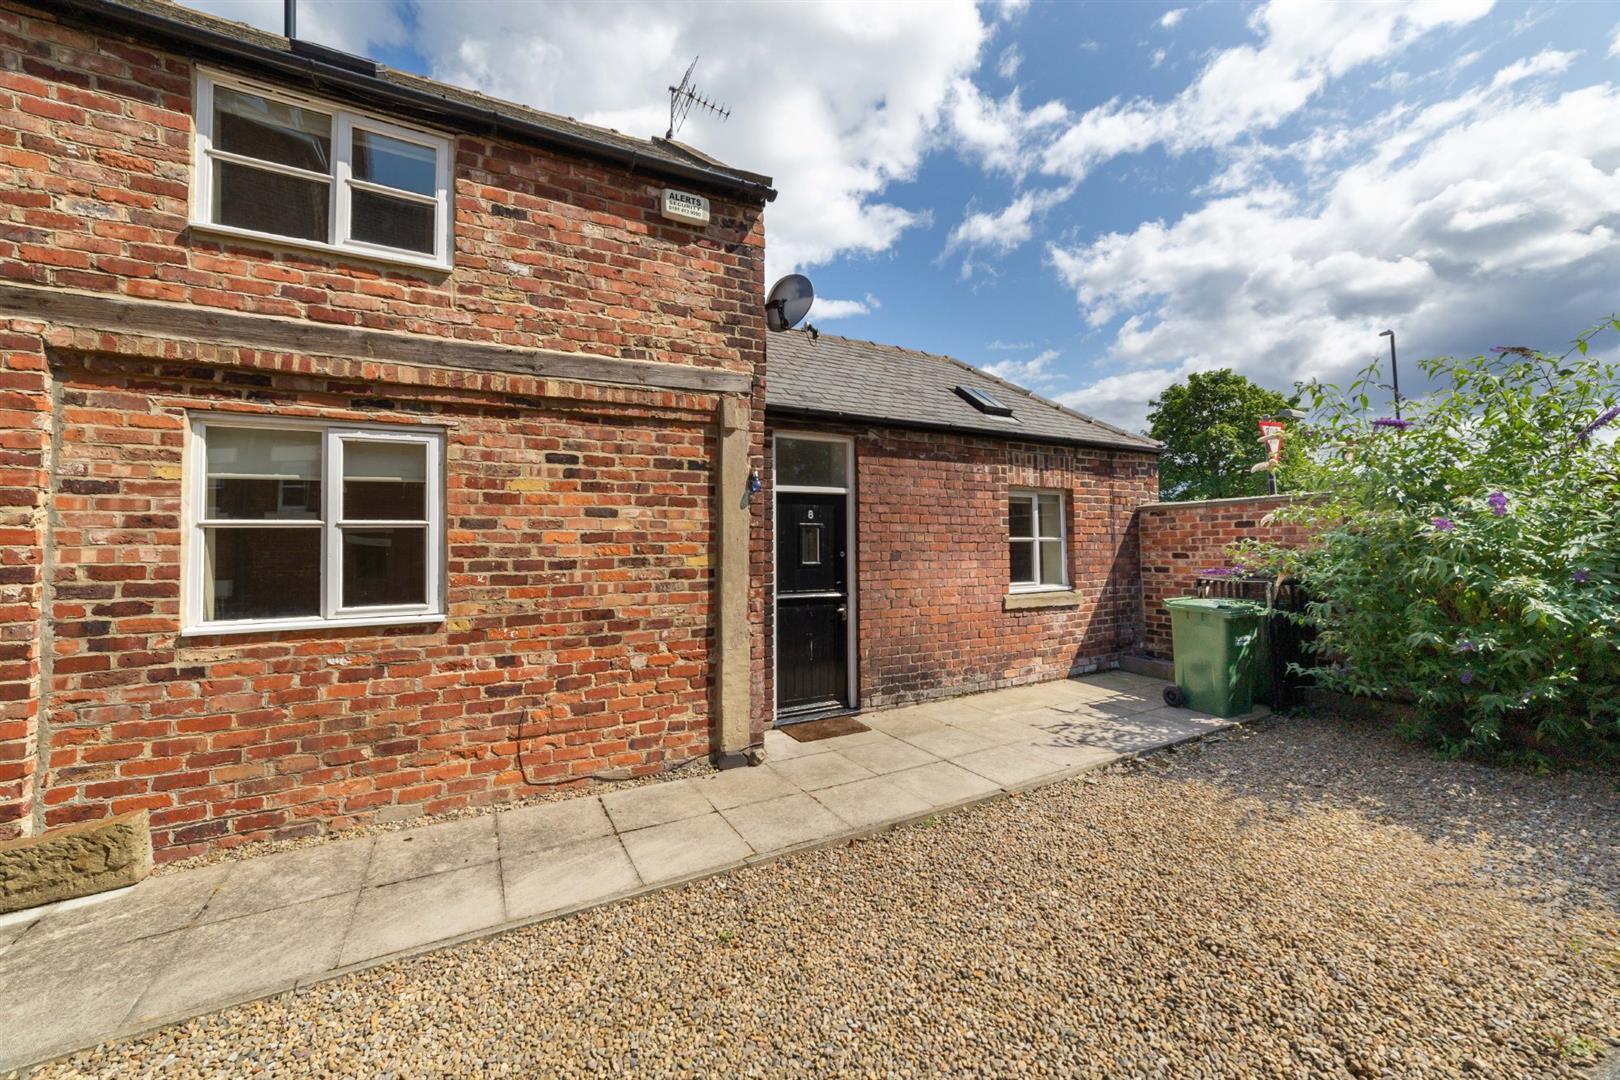 2 bed apartment to rent in Sunderland, SR2 8HA  - Property Image 1